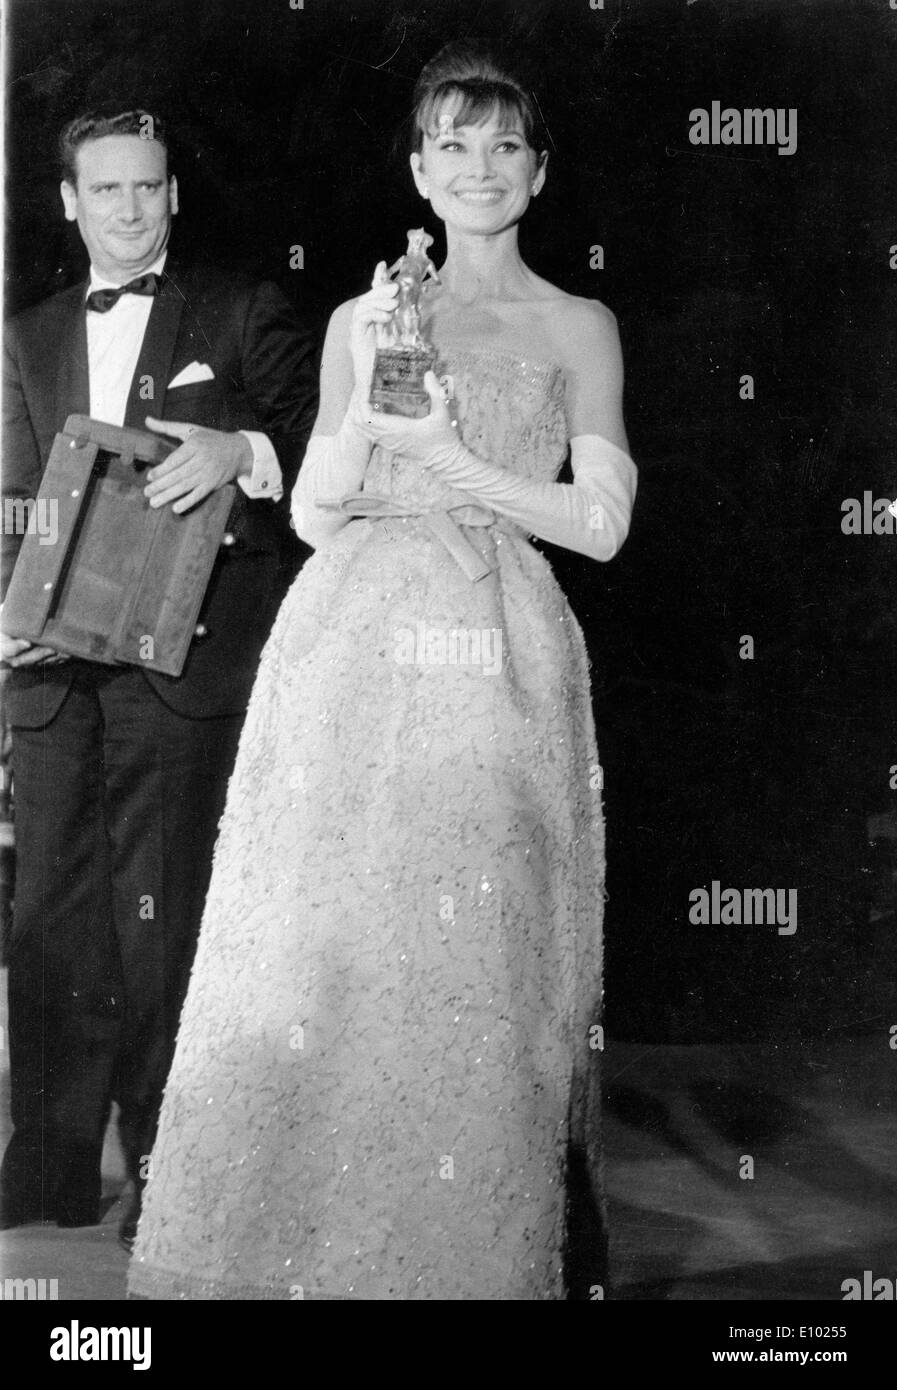 Actress Audrey Hepburn receives 'Breakfast at Tiffany's' award - Stock Image